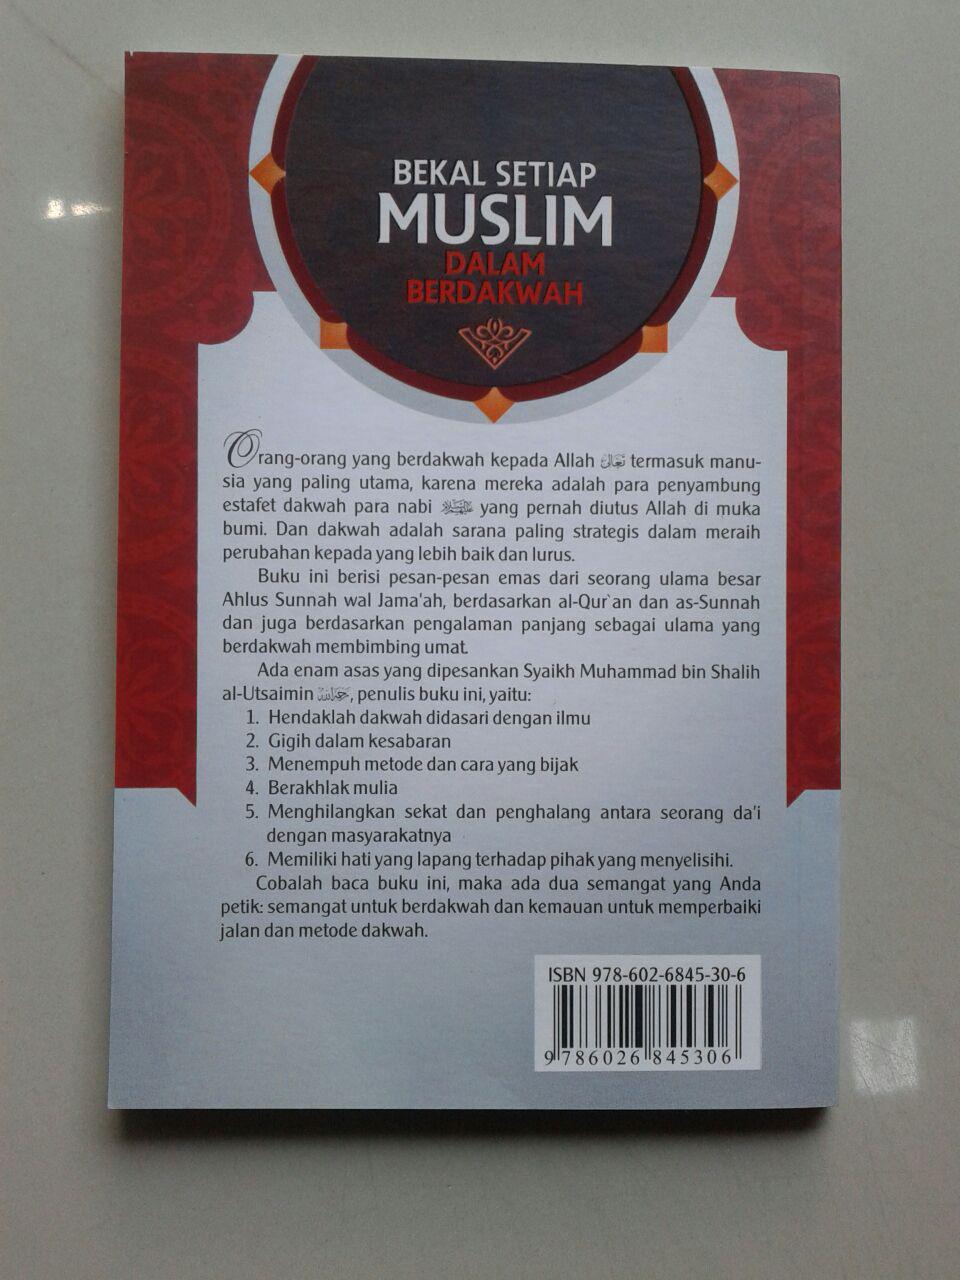 Buku Saku Bekal Setiap Muslim Berdakwah Agar Dakwah Mudah Diterima cover